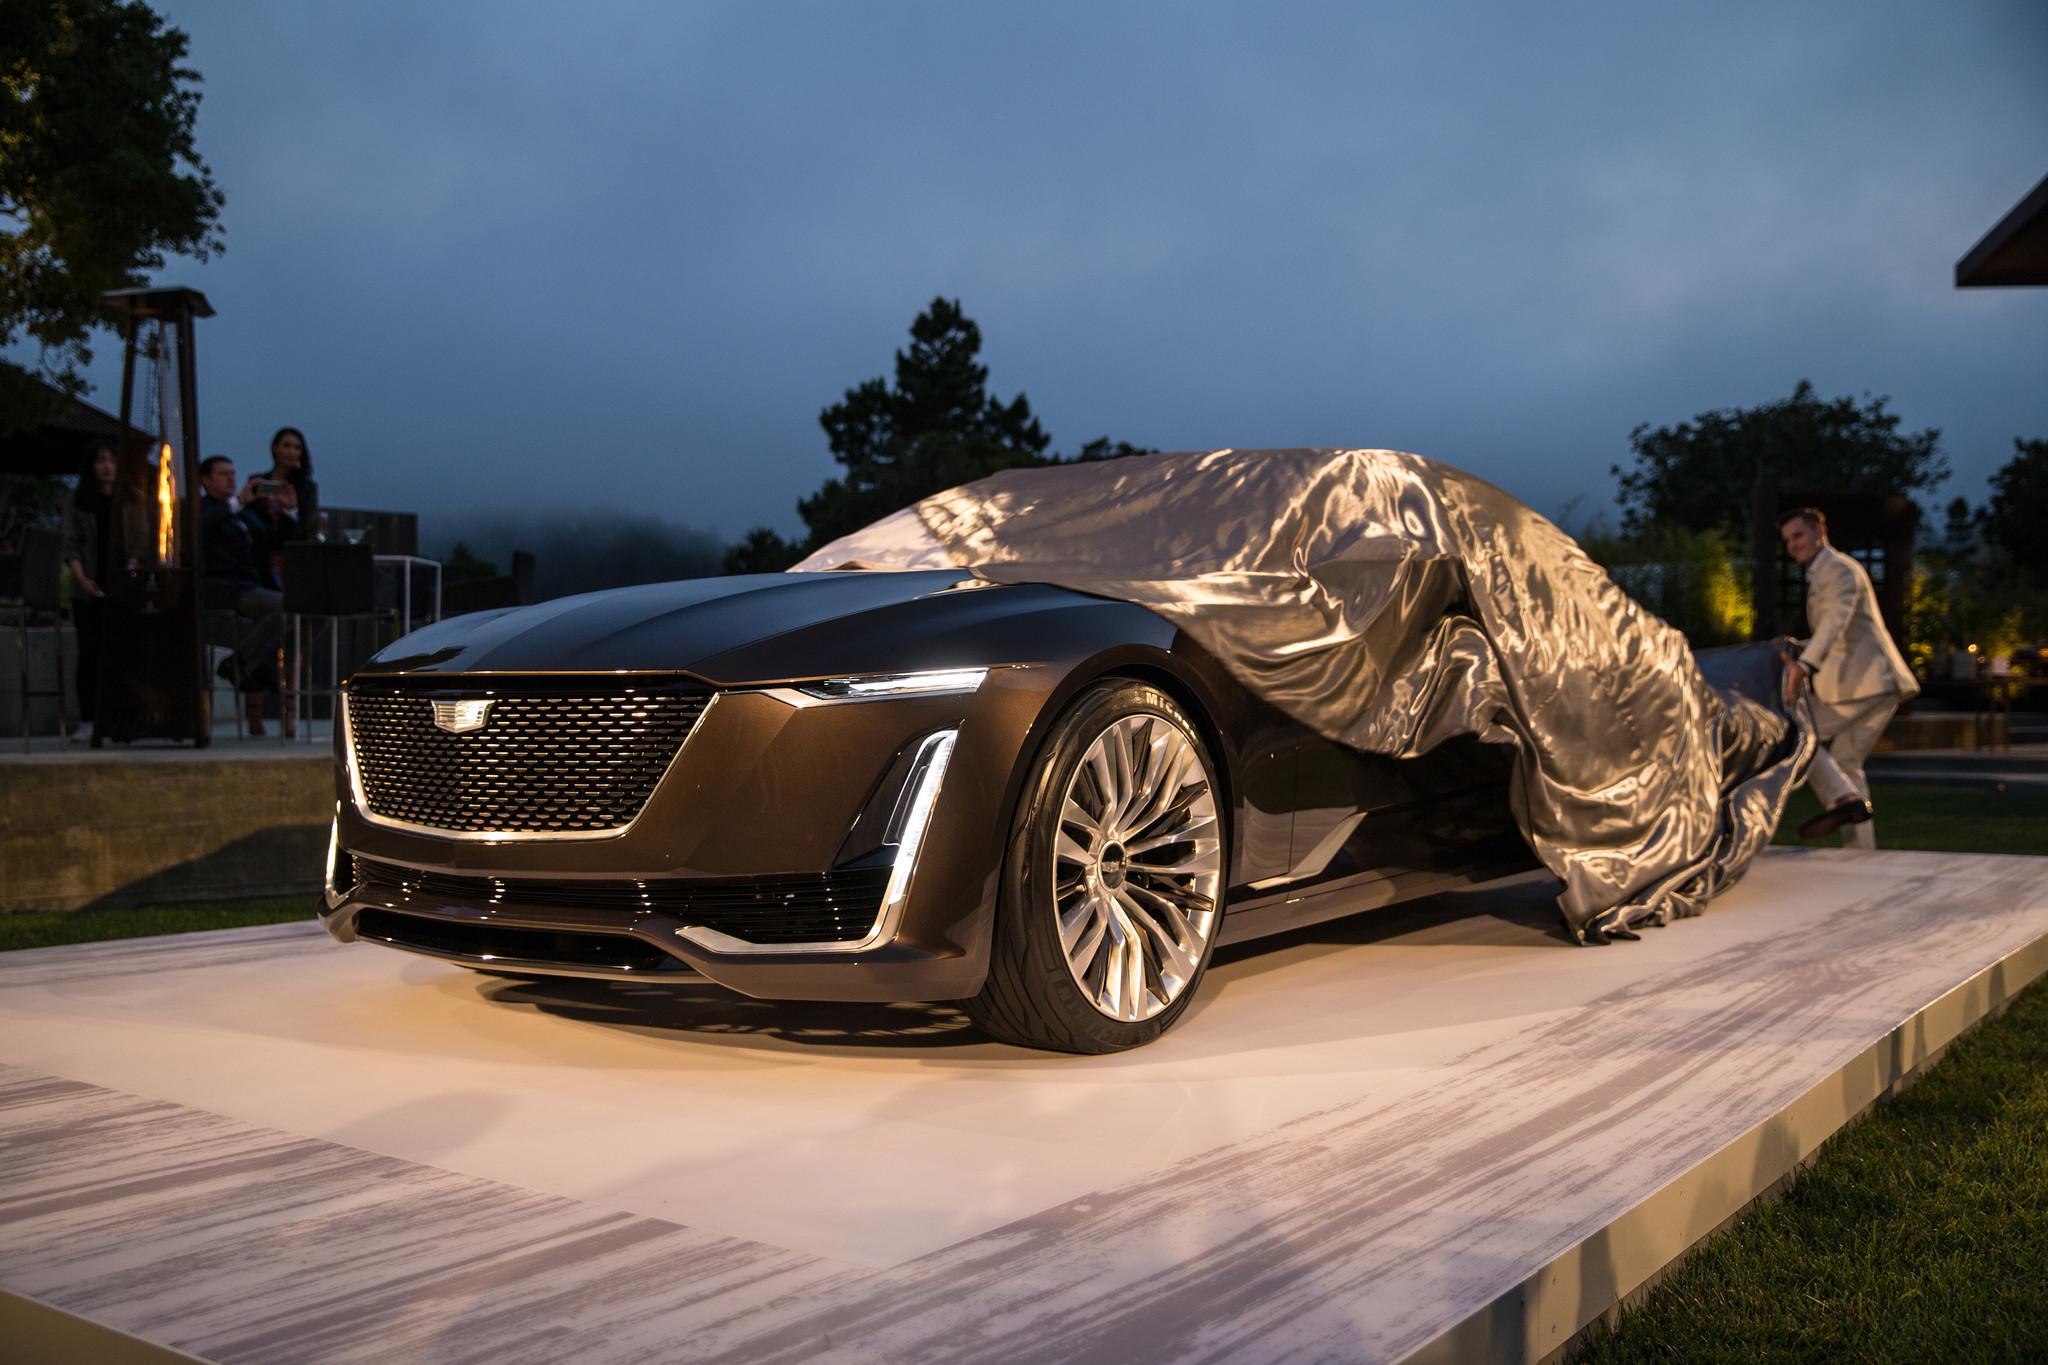 Vision Mercedes Maybach 6 and Cadillac Escala concept cars ...